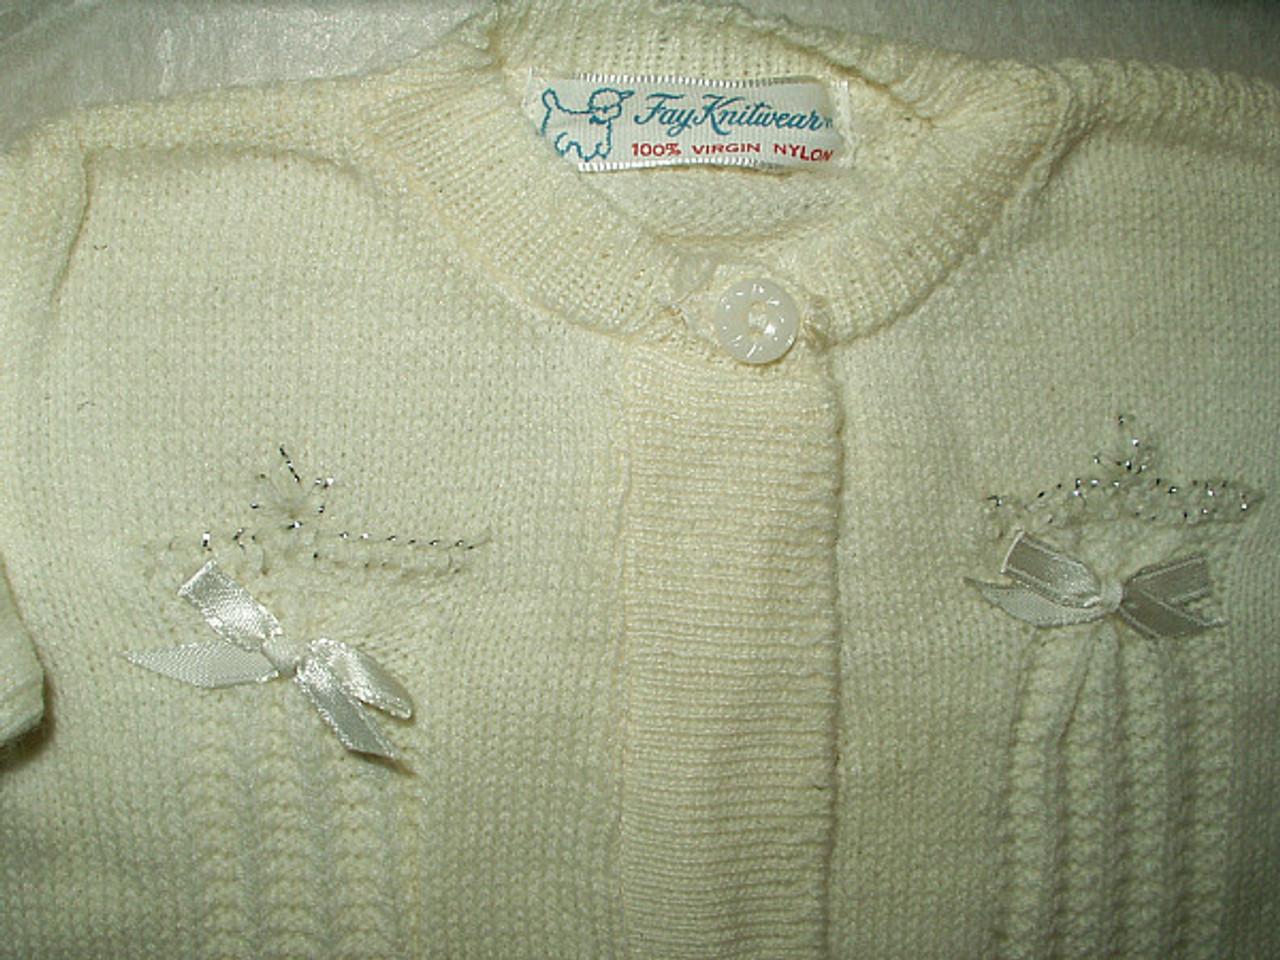 Vintage Boxed Baby Sweater Bootie Set Original Box 1940 1950